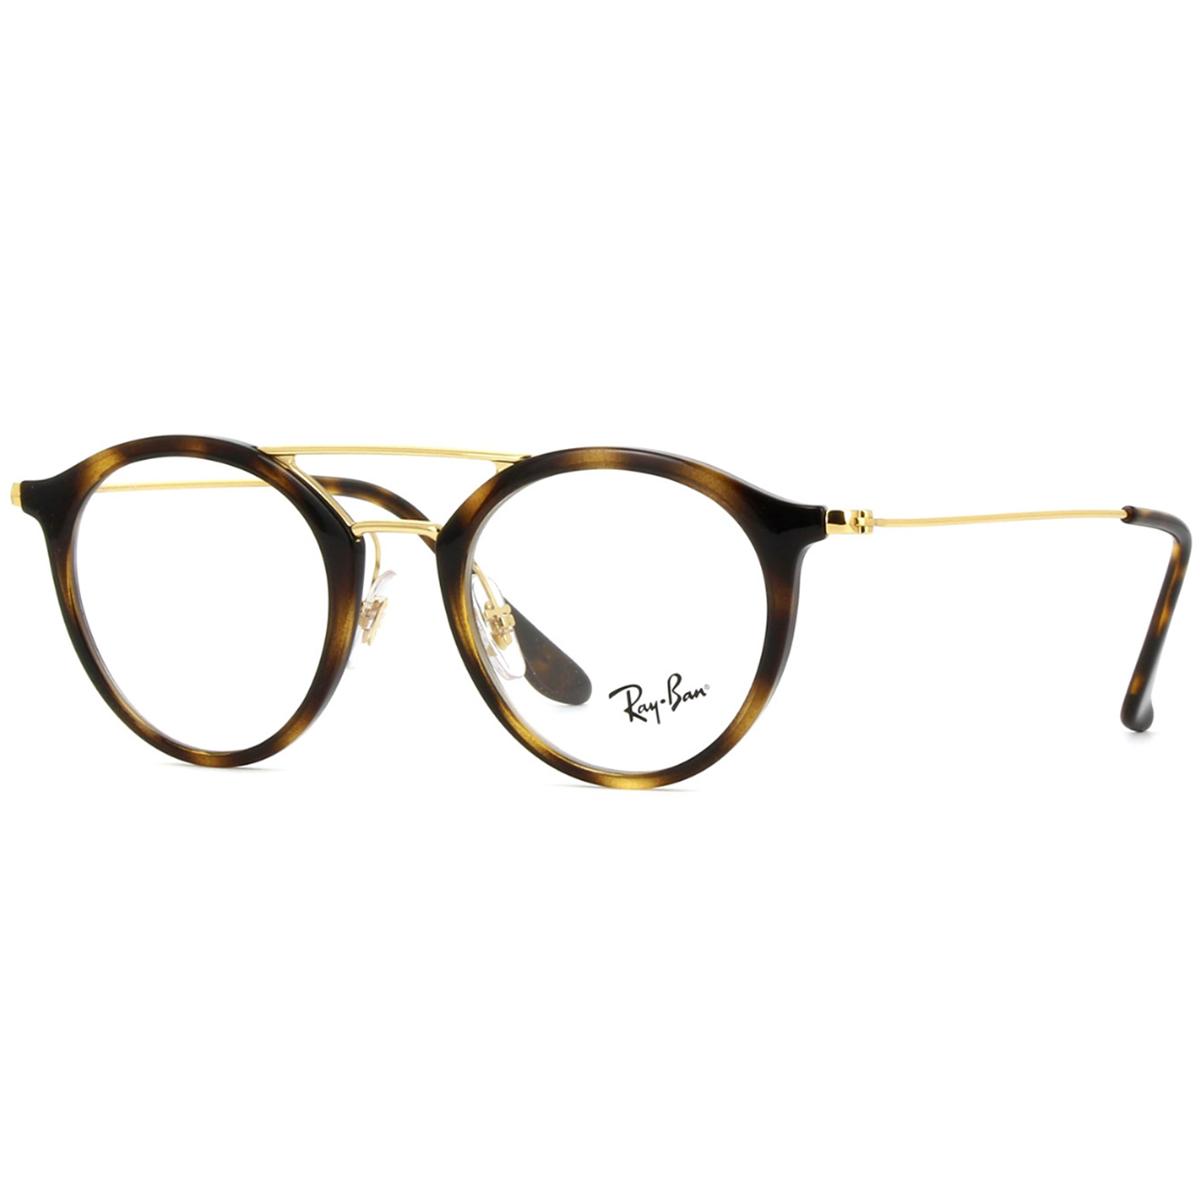 a439558cca129 Óculos de Grau Ray Ban RB7097